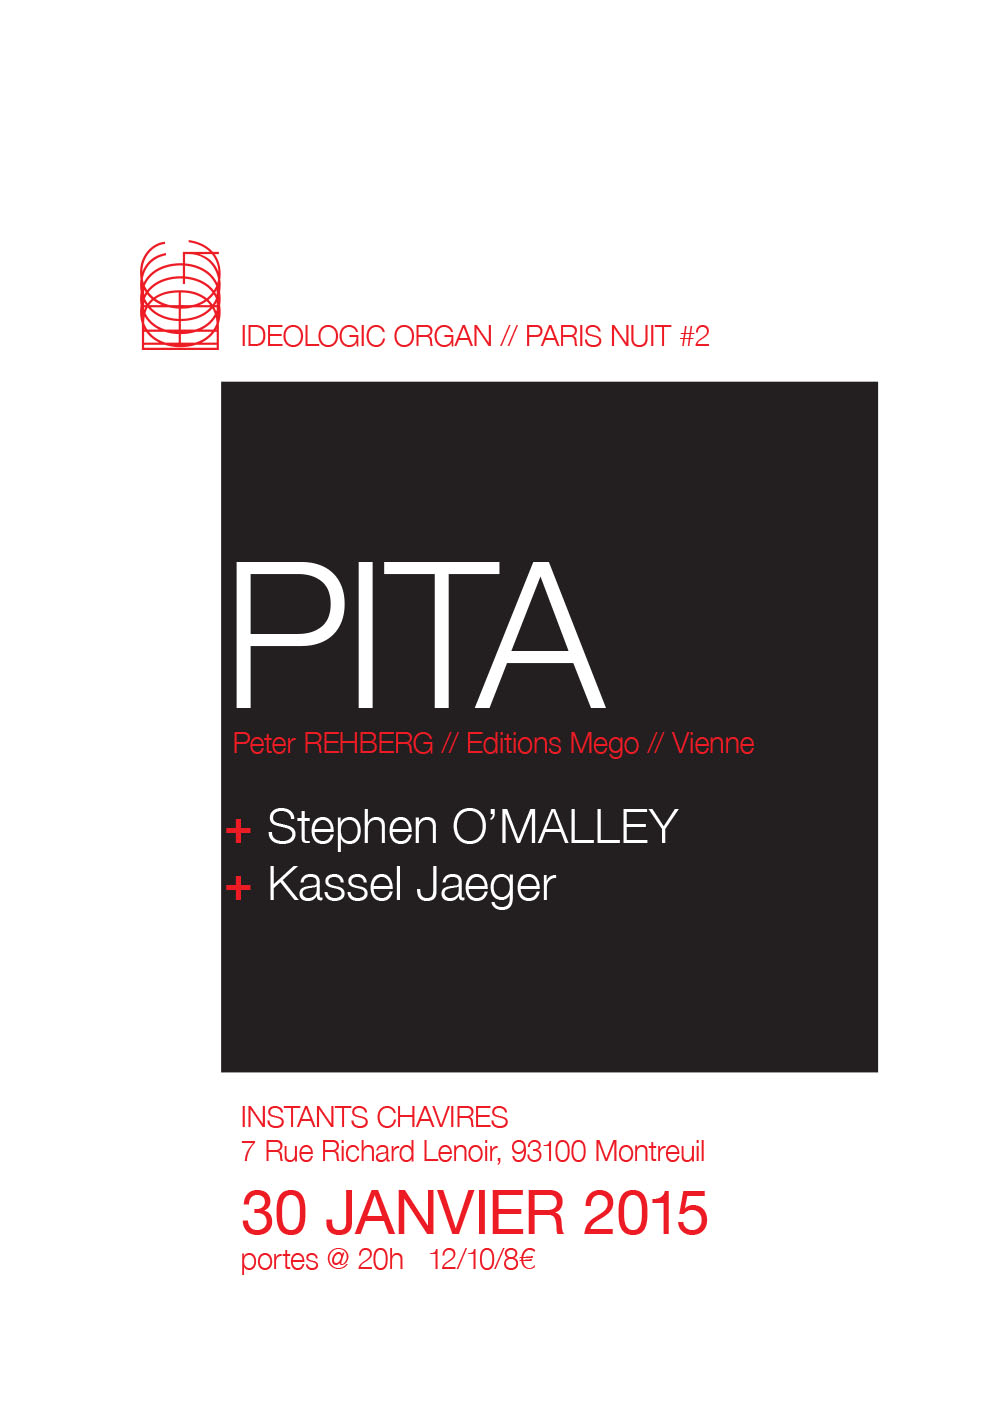 Stephen O'Malley (solo) @ Ideologic Organ night #2 / Instants Chavirés